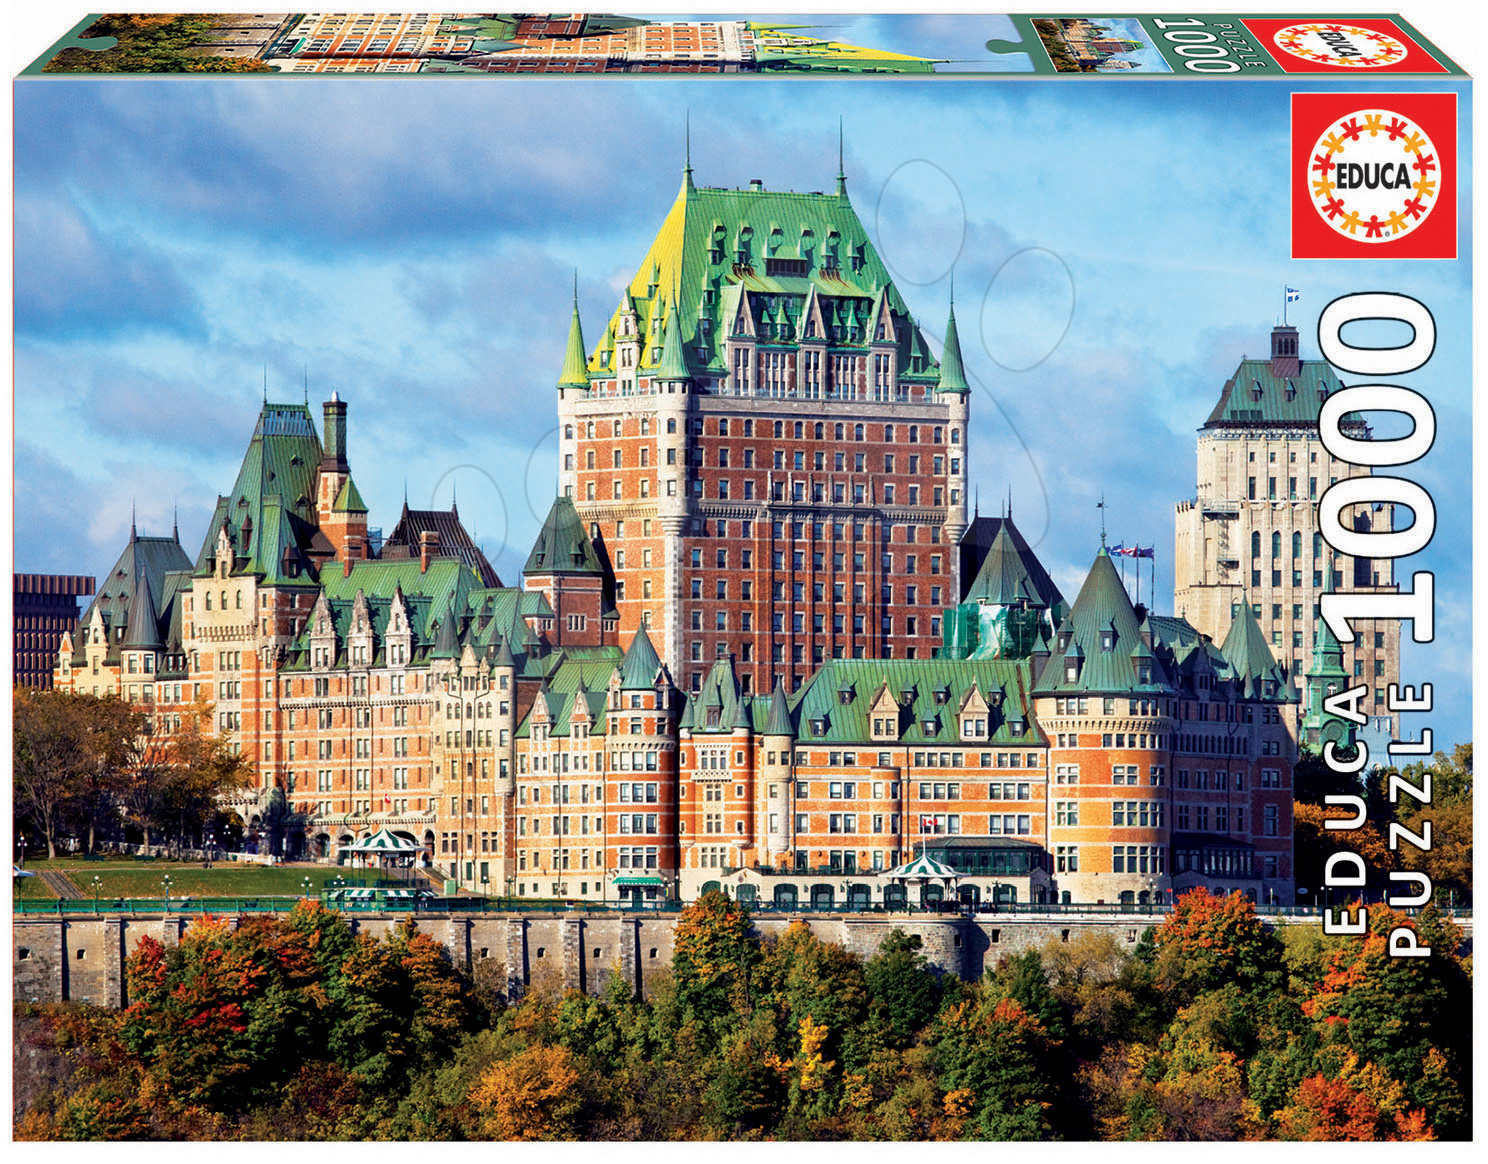 Puzzle Genuine Zámek Frontenac, Québec Educa 1000 dílů od 11 let